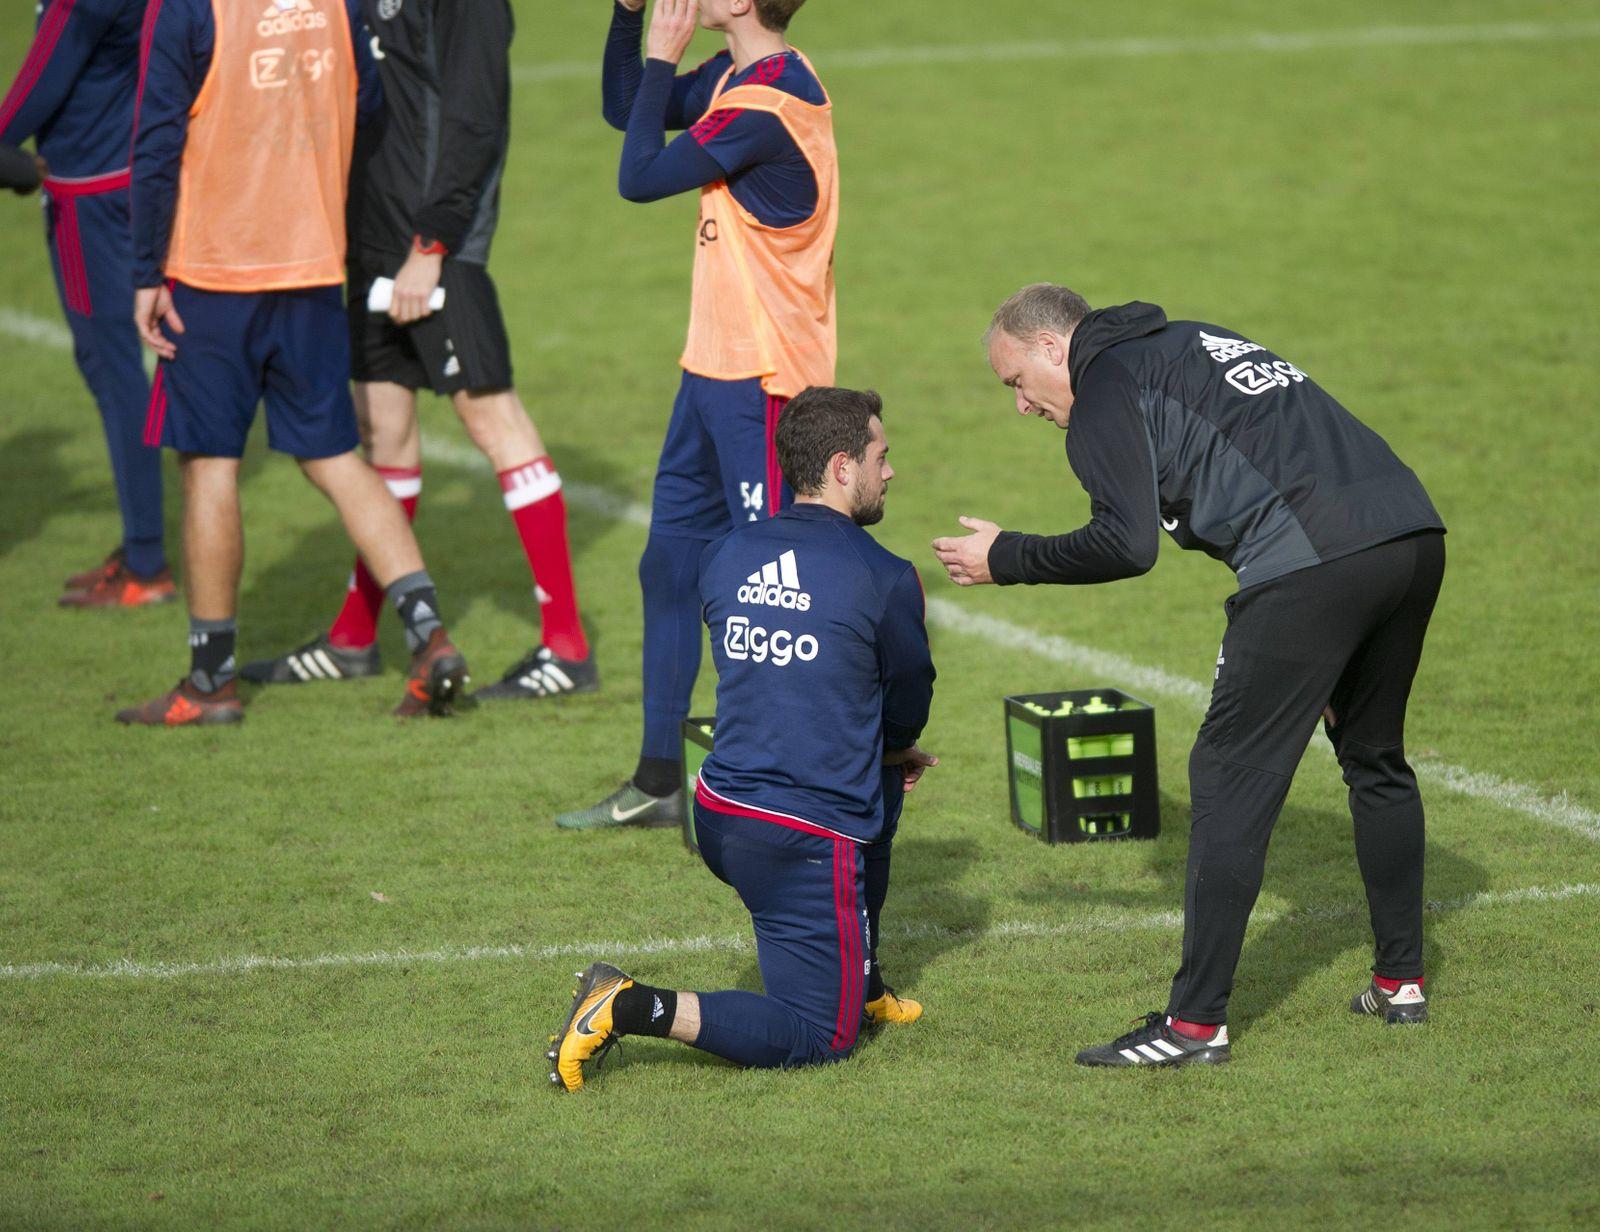 26 10 2017 VOETBAL TRAINING AJAX AMSTERDAM Amin Younes Ajax Dennis Bergkamp assistent trainer